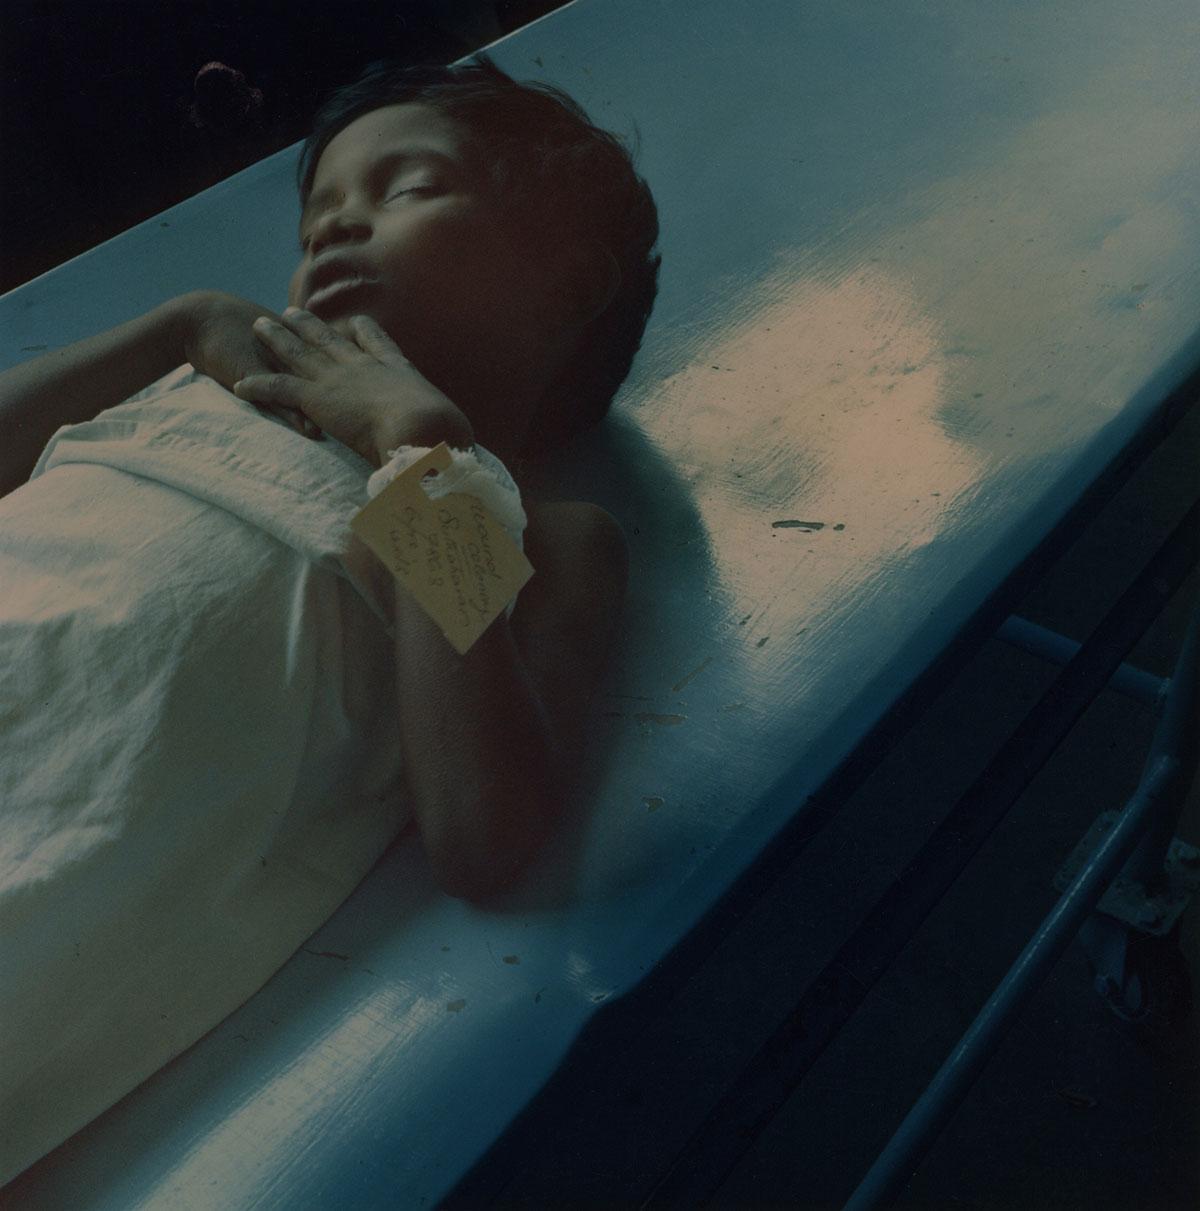 2-Wounded-Calamity_-Batticaloa-1988-002.jpg